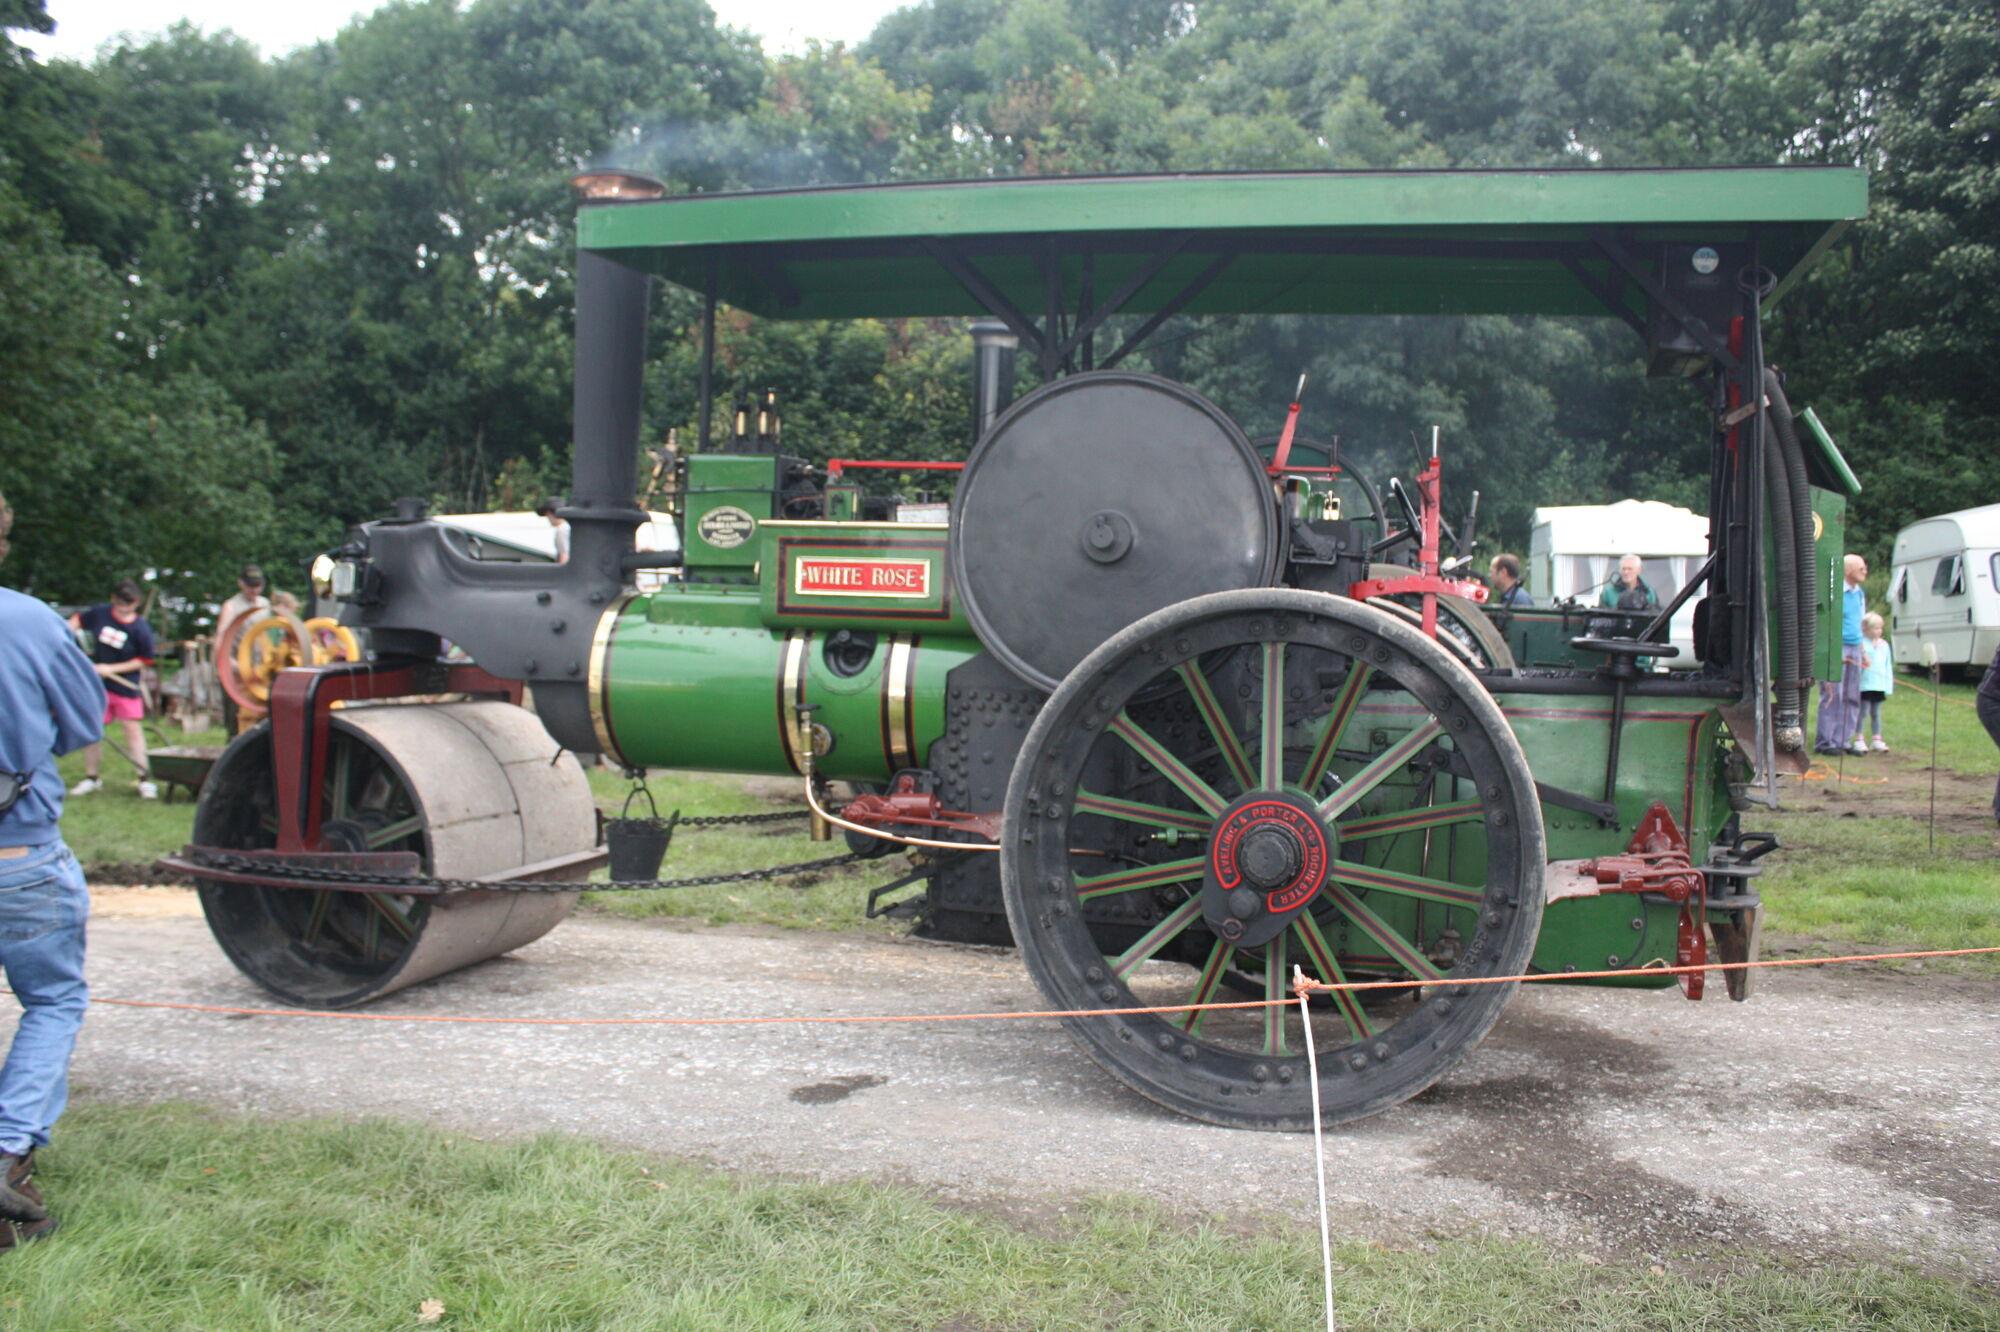 Aveling porter no 8506 tractor construction plant wiki fandom powered by wikia - Porter international wiki ...